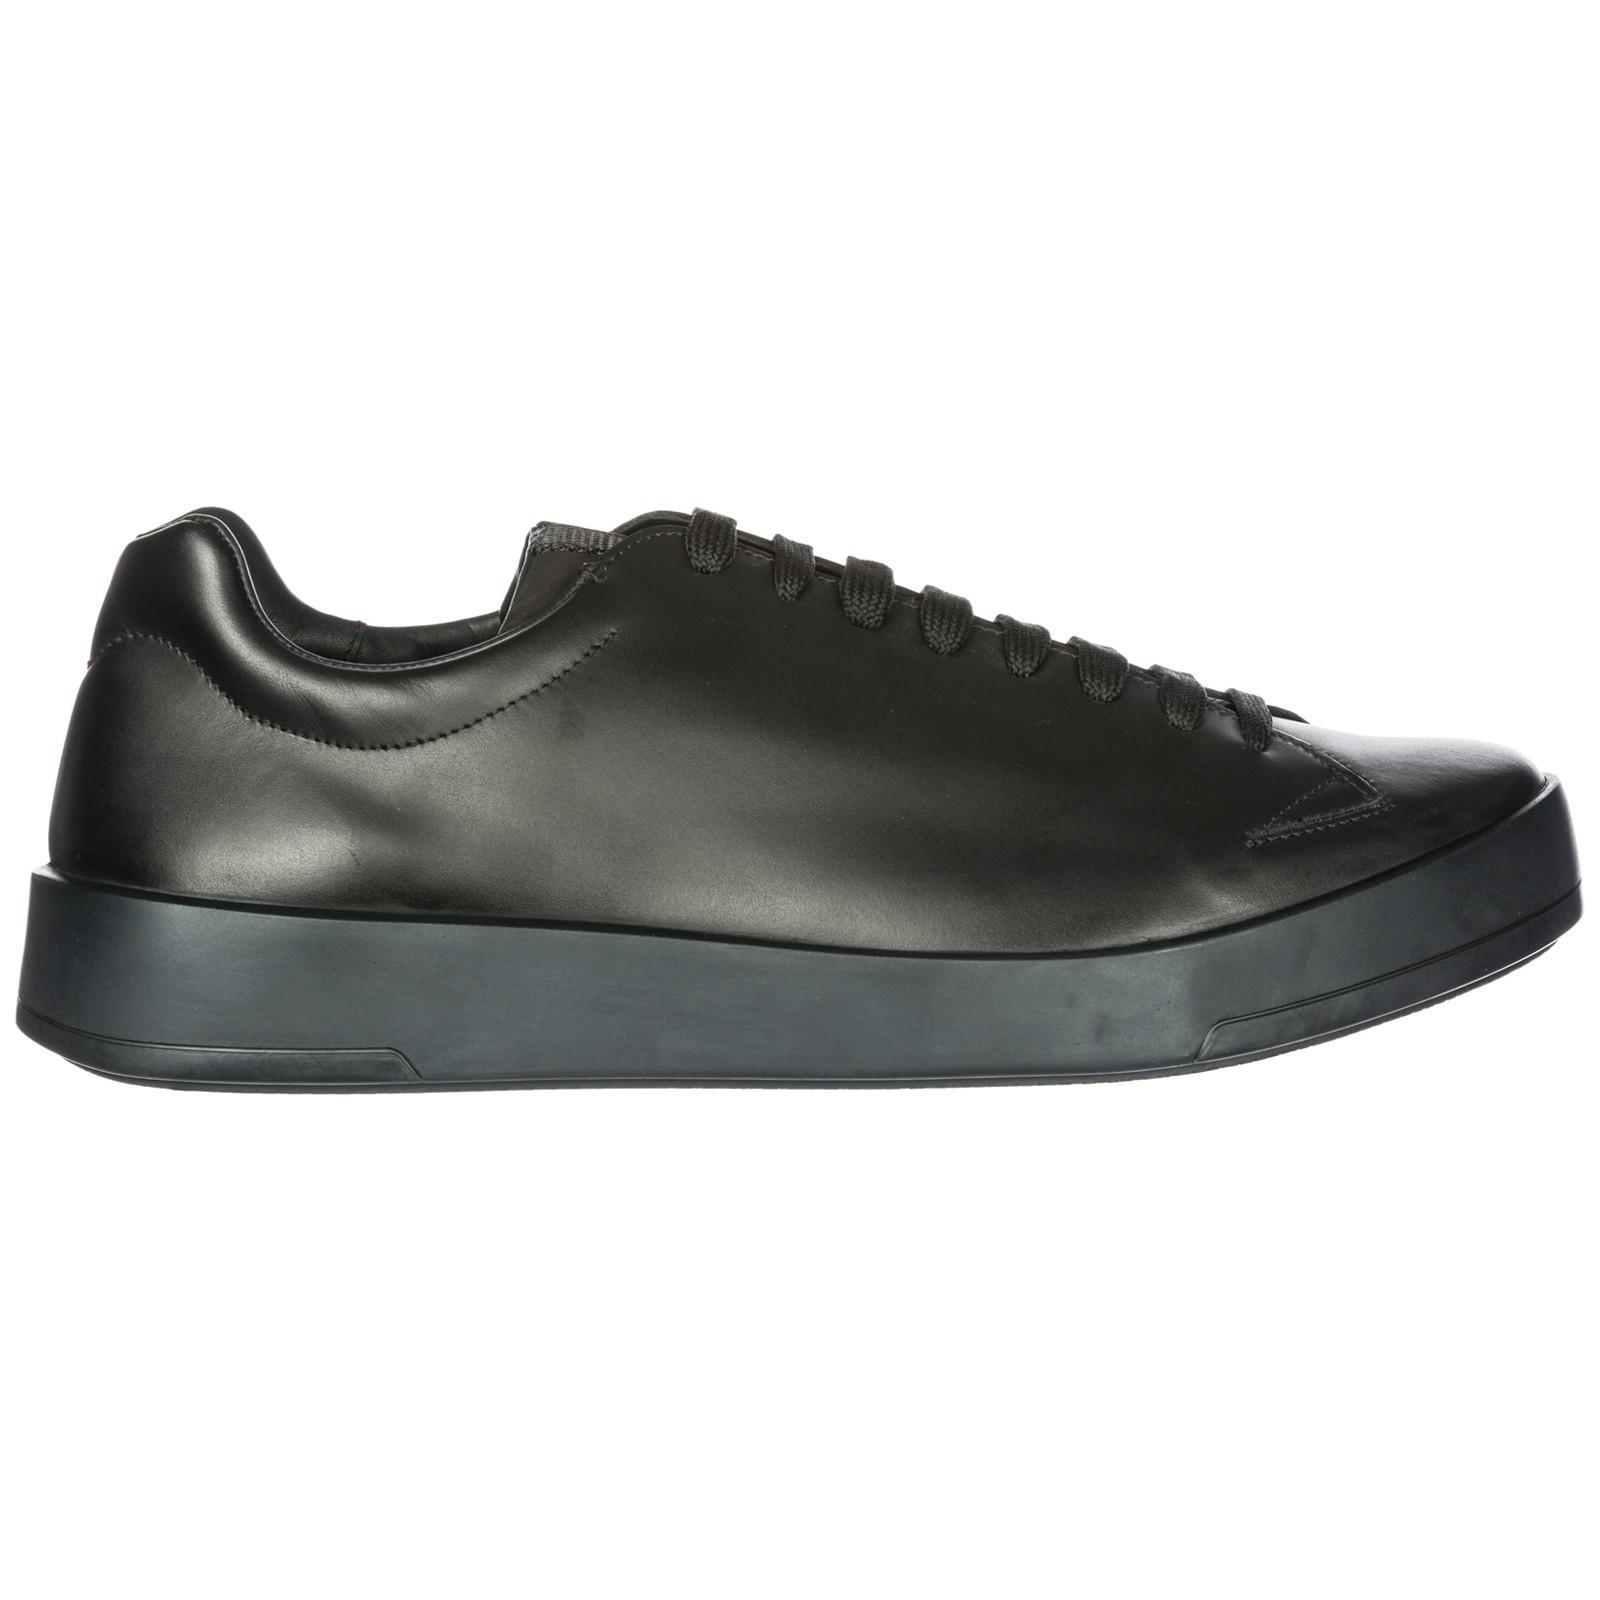 14762269929f1 Prada Herrenschuhe Herren Leder Schuhe Sneakers In Black